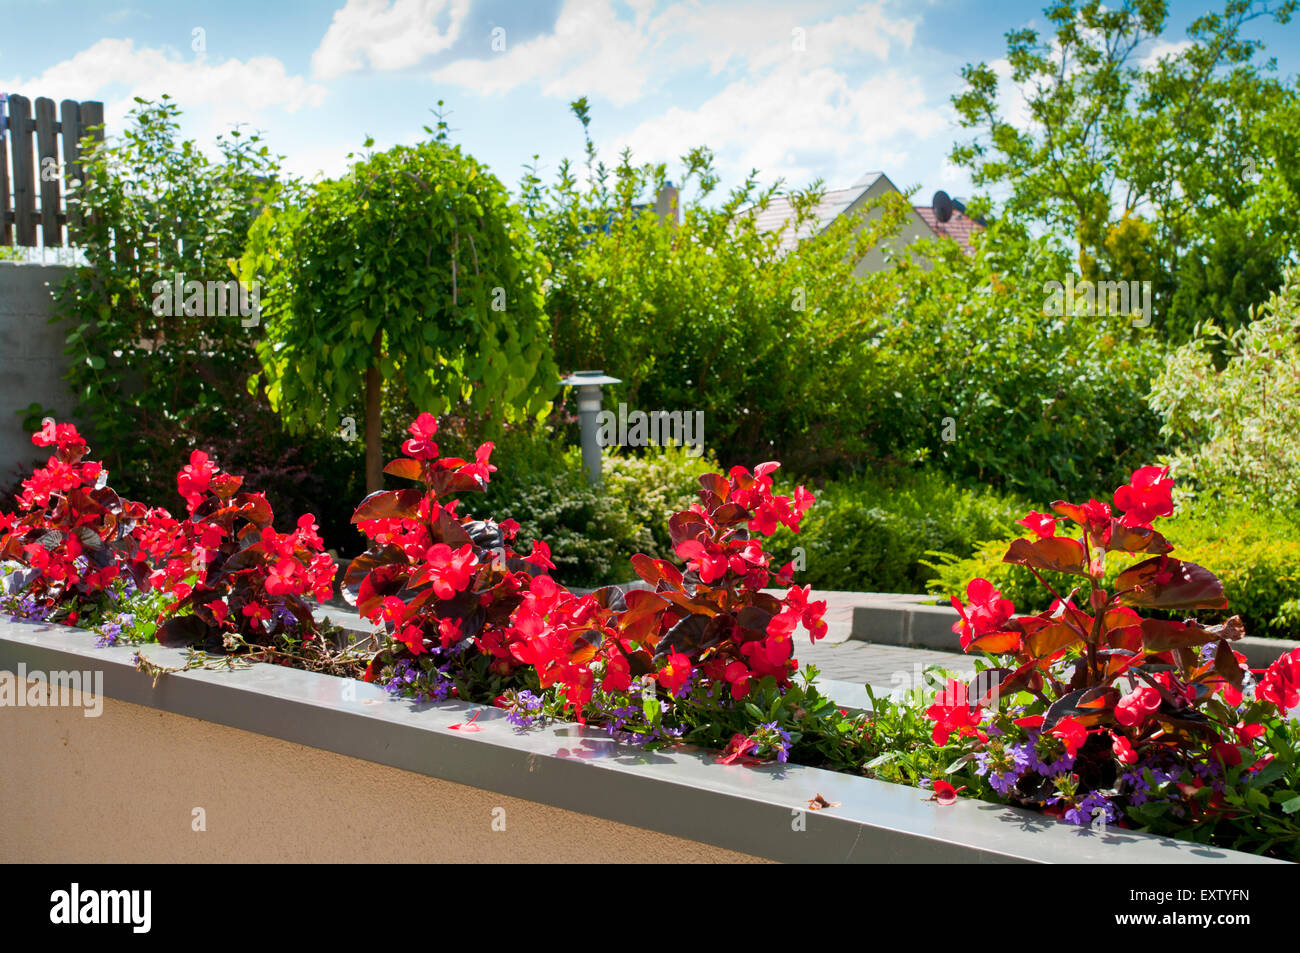 Balkon Bauen Haus Blume Blumen Grune Gartenstadt Heimat Europa